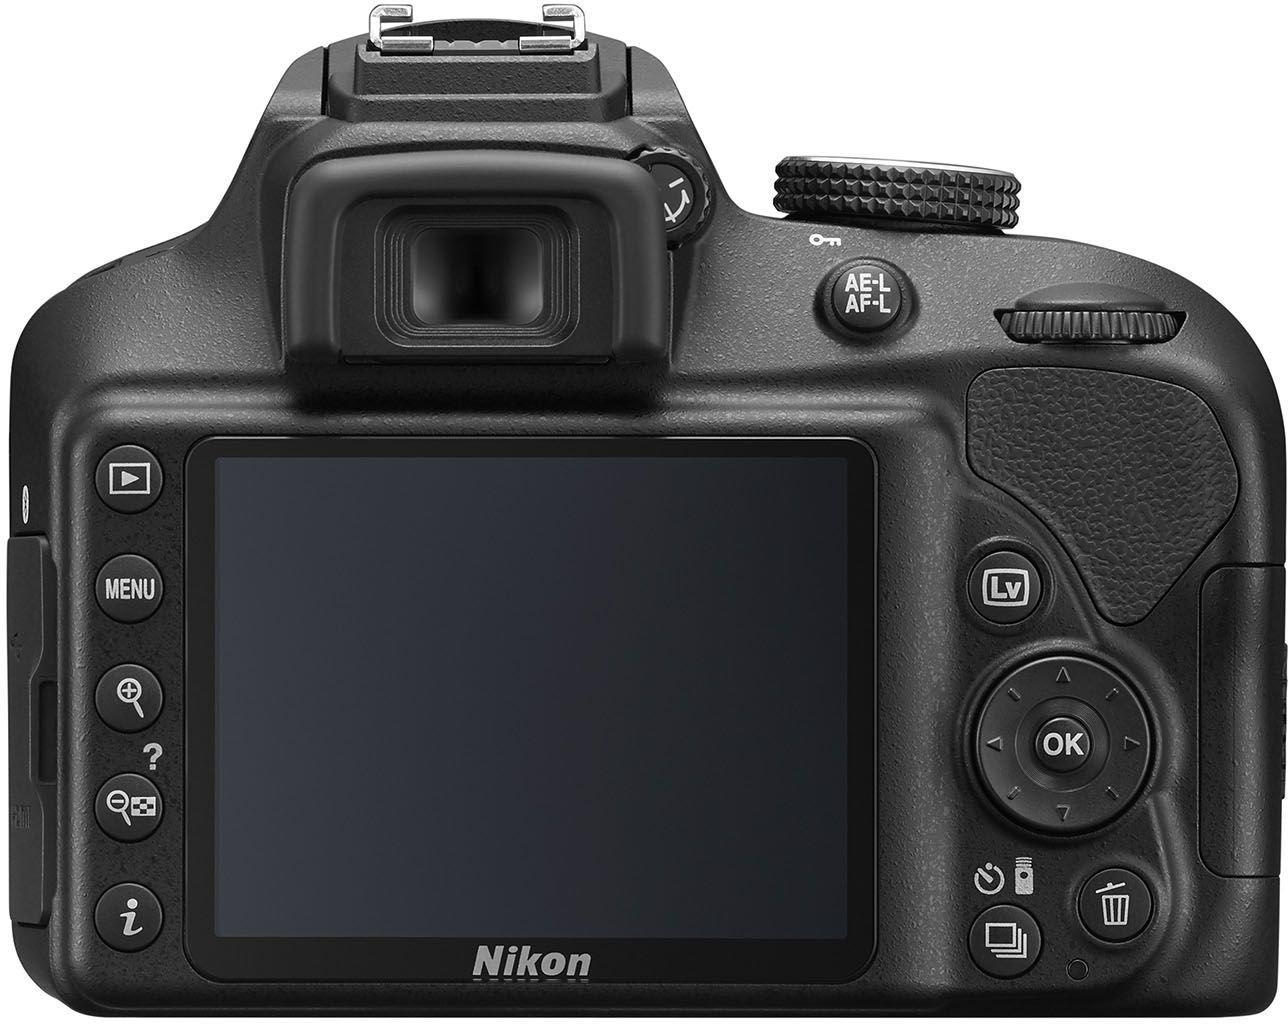 d8b6a63c8646 Cámara reflex Nikon D3400 | La Tienda del Viajero